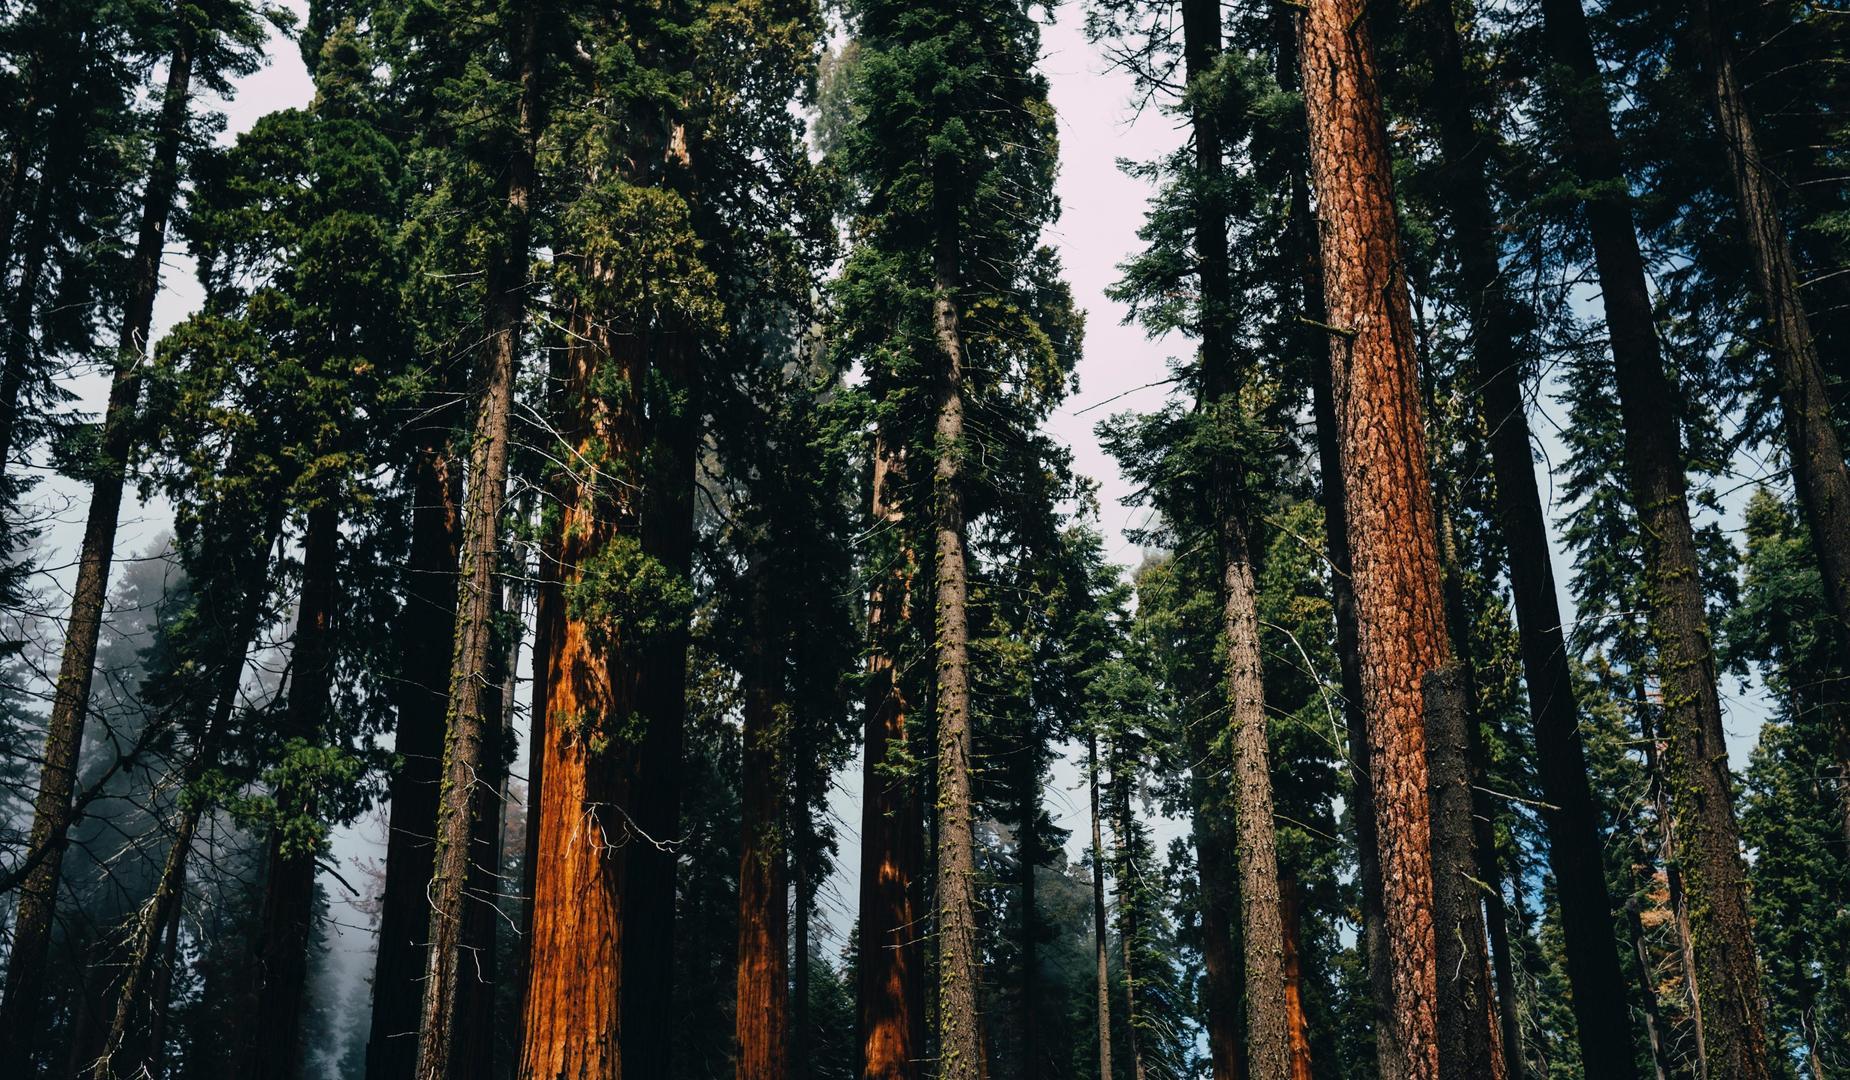 Picture of sequoia trees